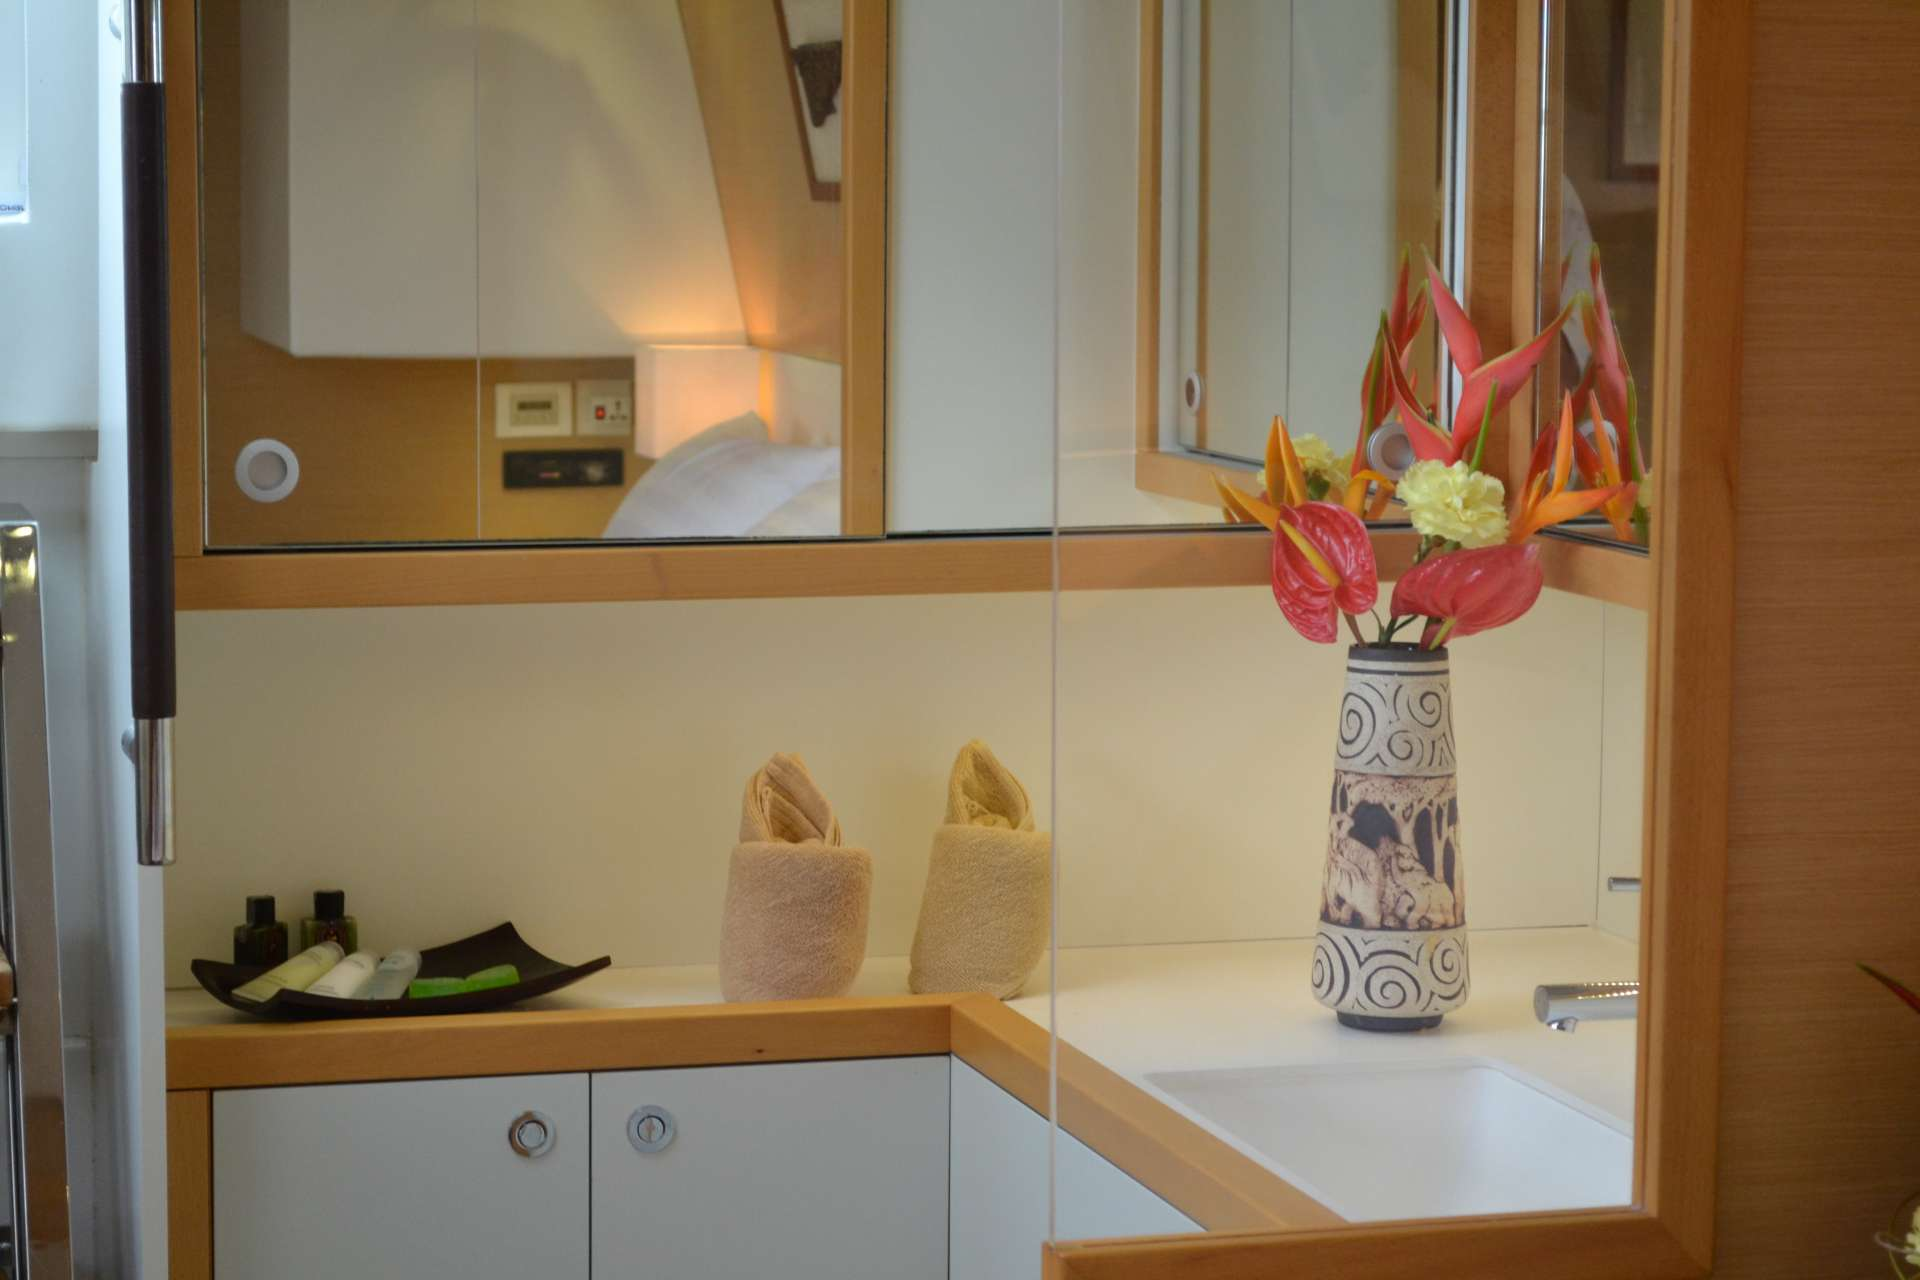 Bathroom and amenities